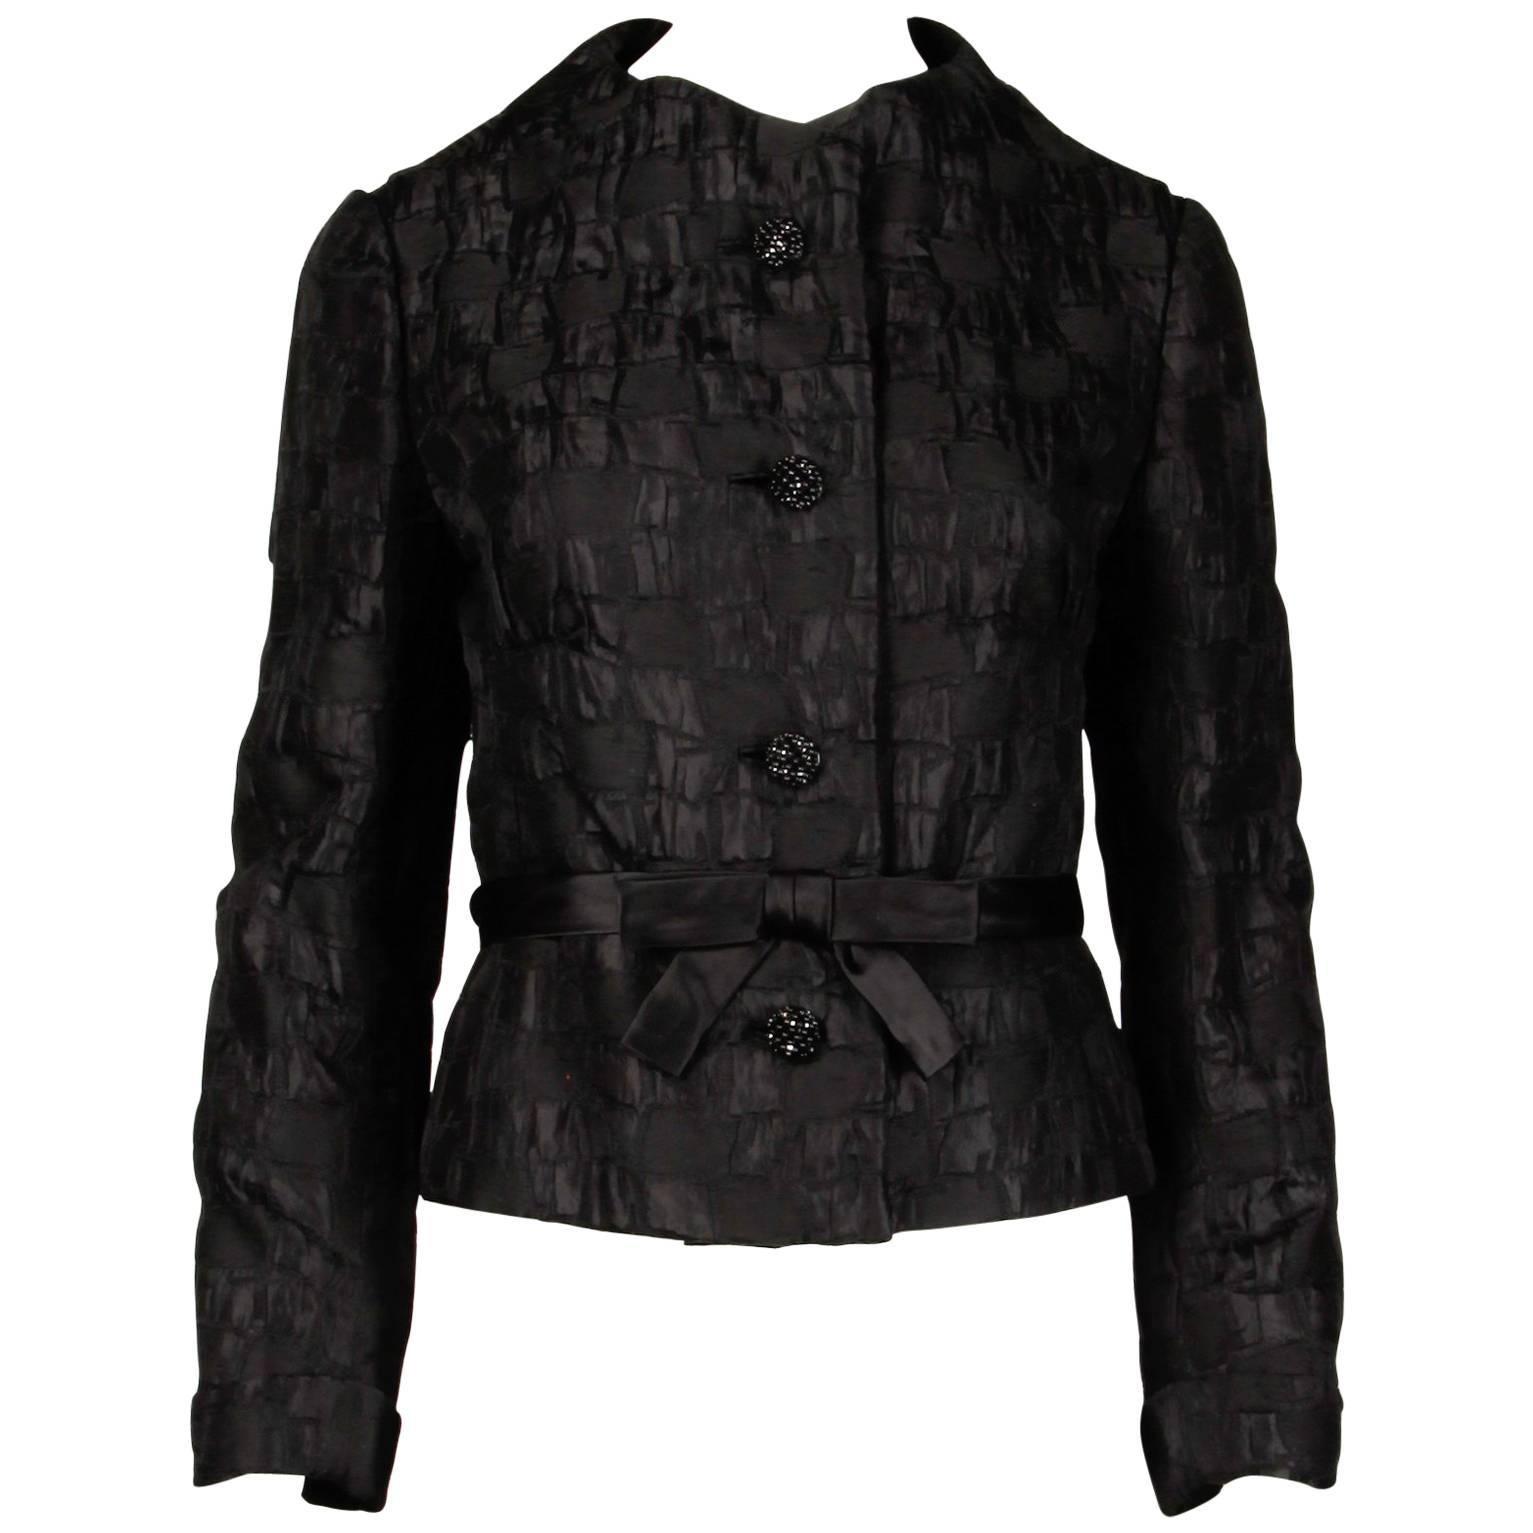 1960s Vintage Michael Novarese Black + Pink Silk Jacket with Rhinestone Buttons